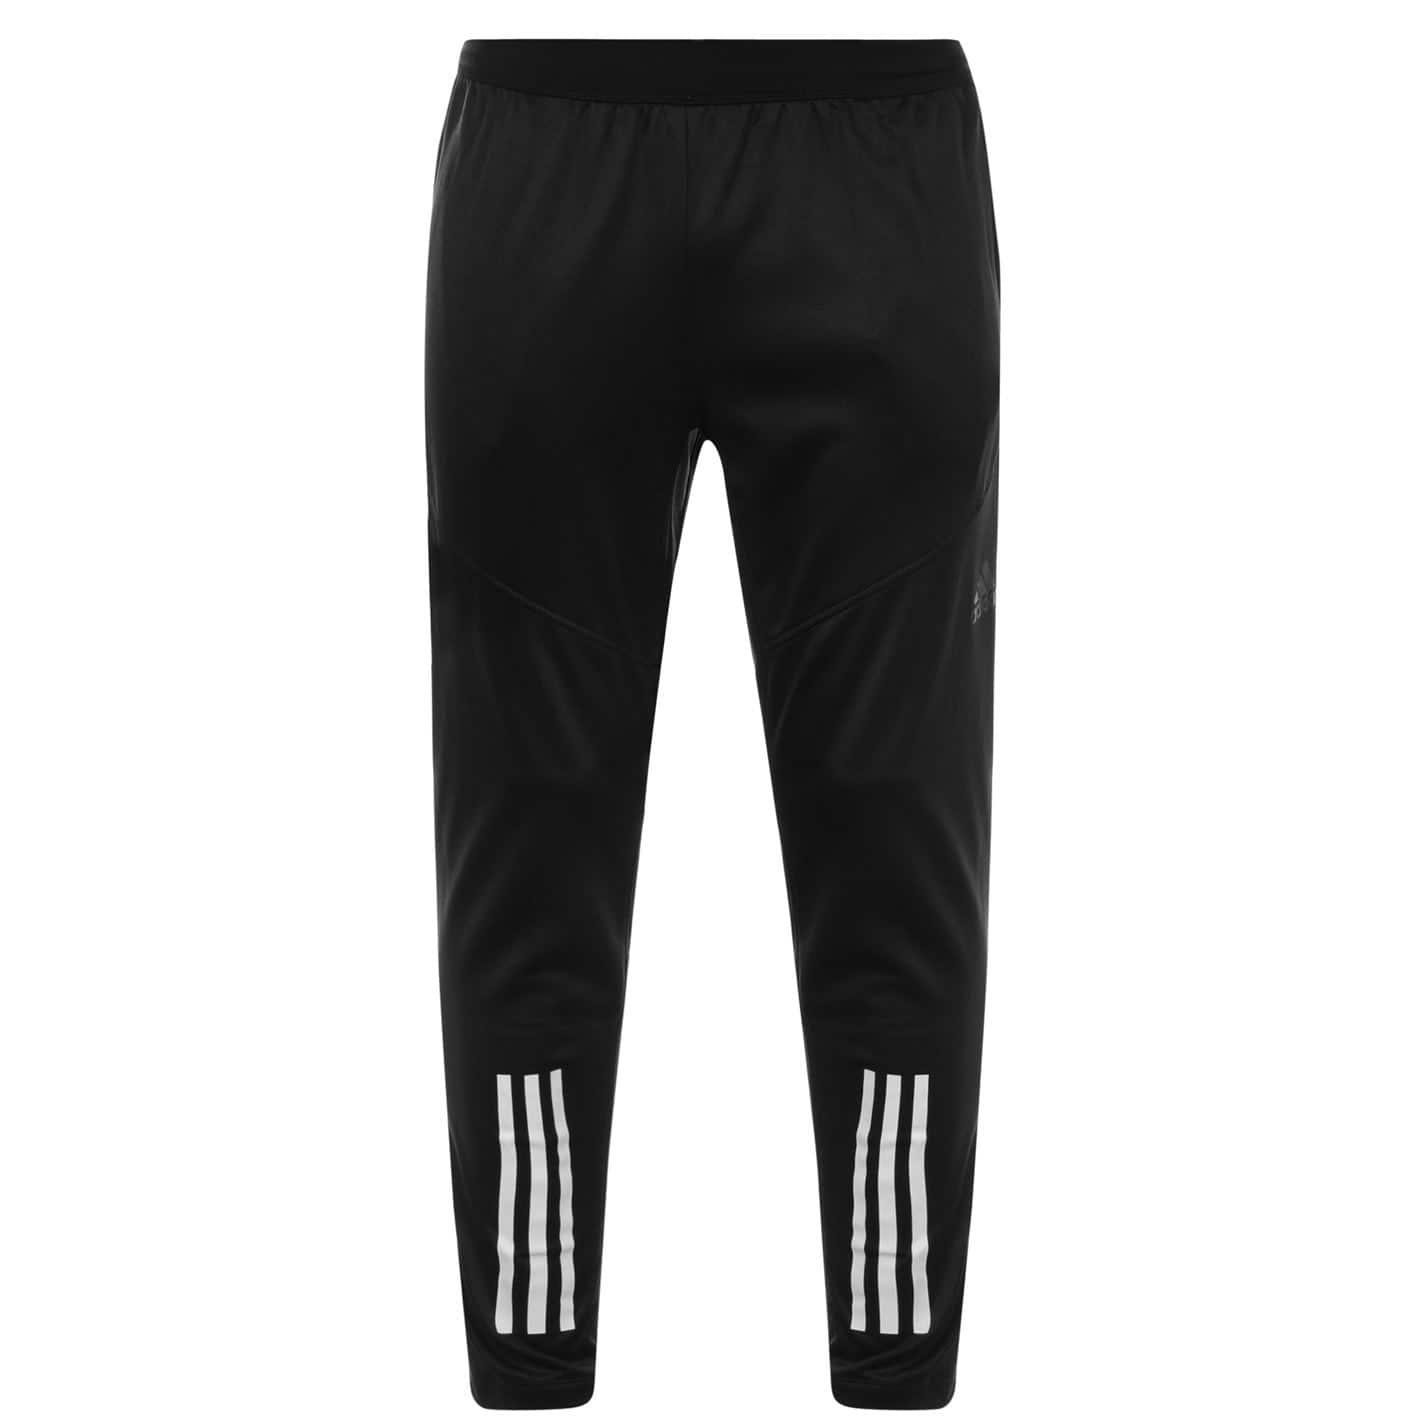 Adidas 3 Stripe Tracksuit Bottoms Mens